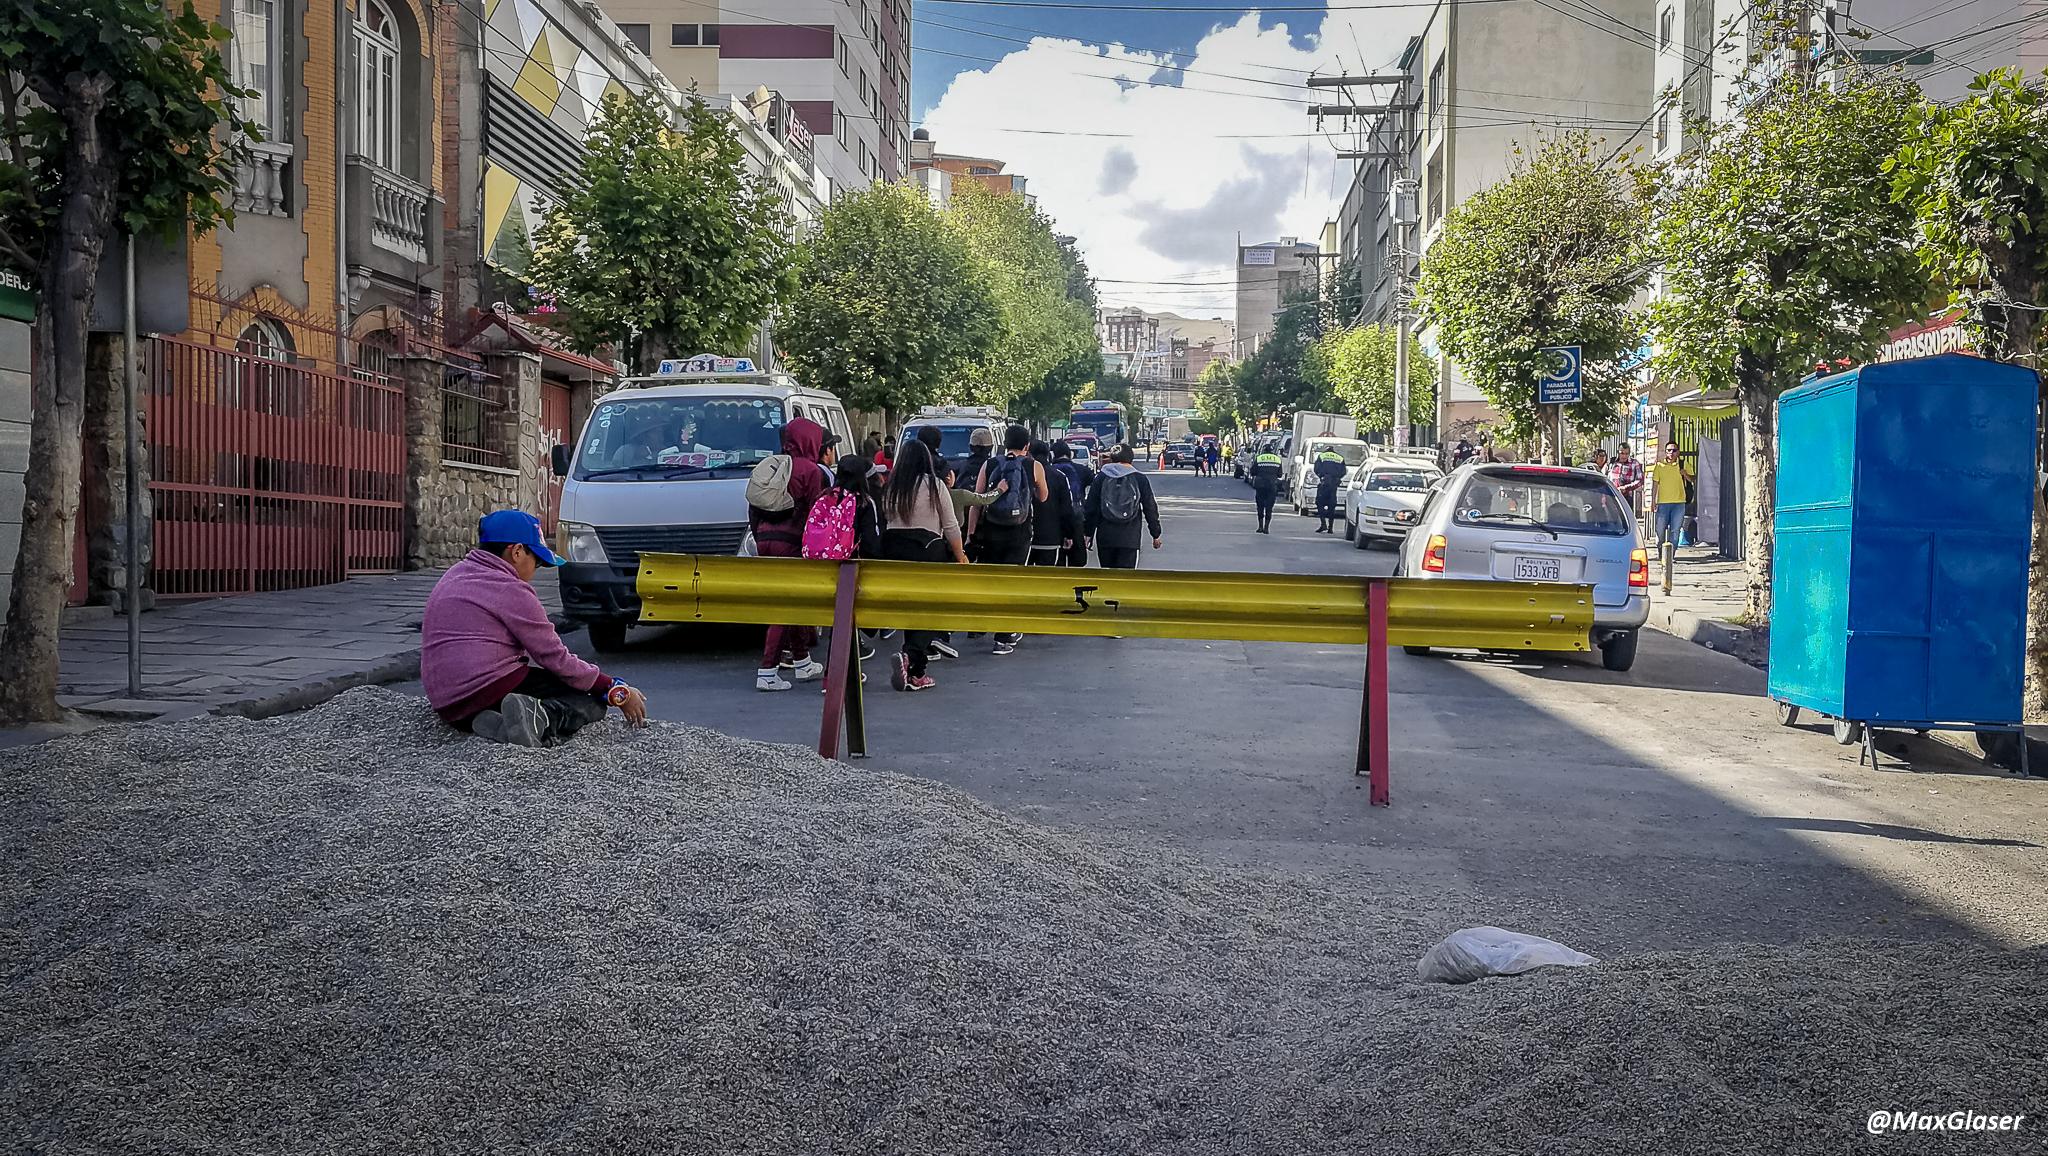 Obras en la Plaza del Estadio - Avenida Saavedra